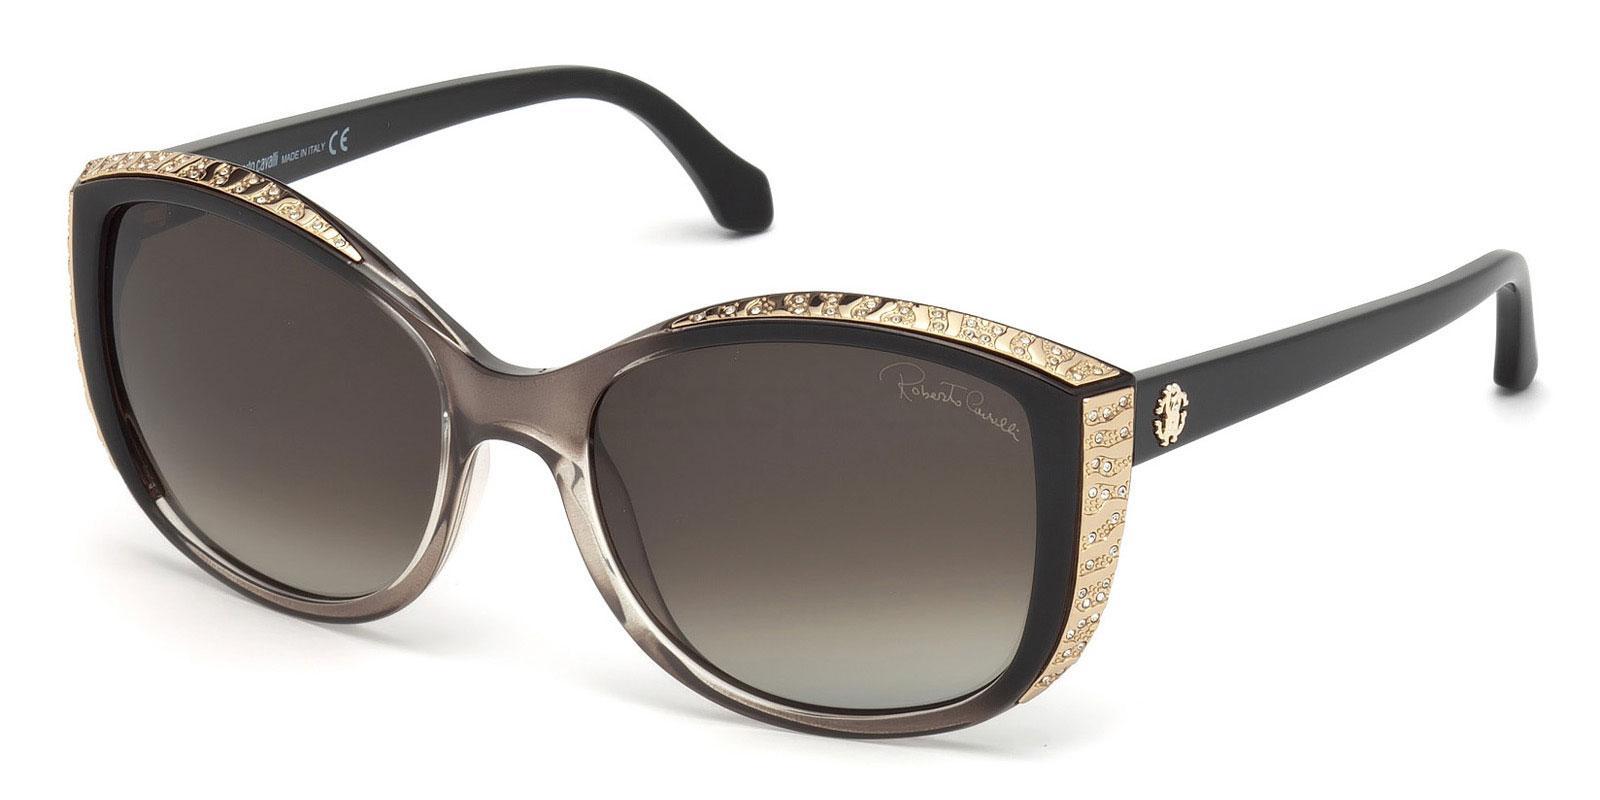 05B RC1015 Sunglasses, Roberto Cavalli